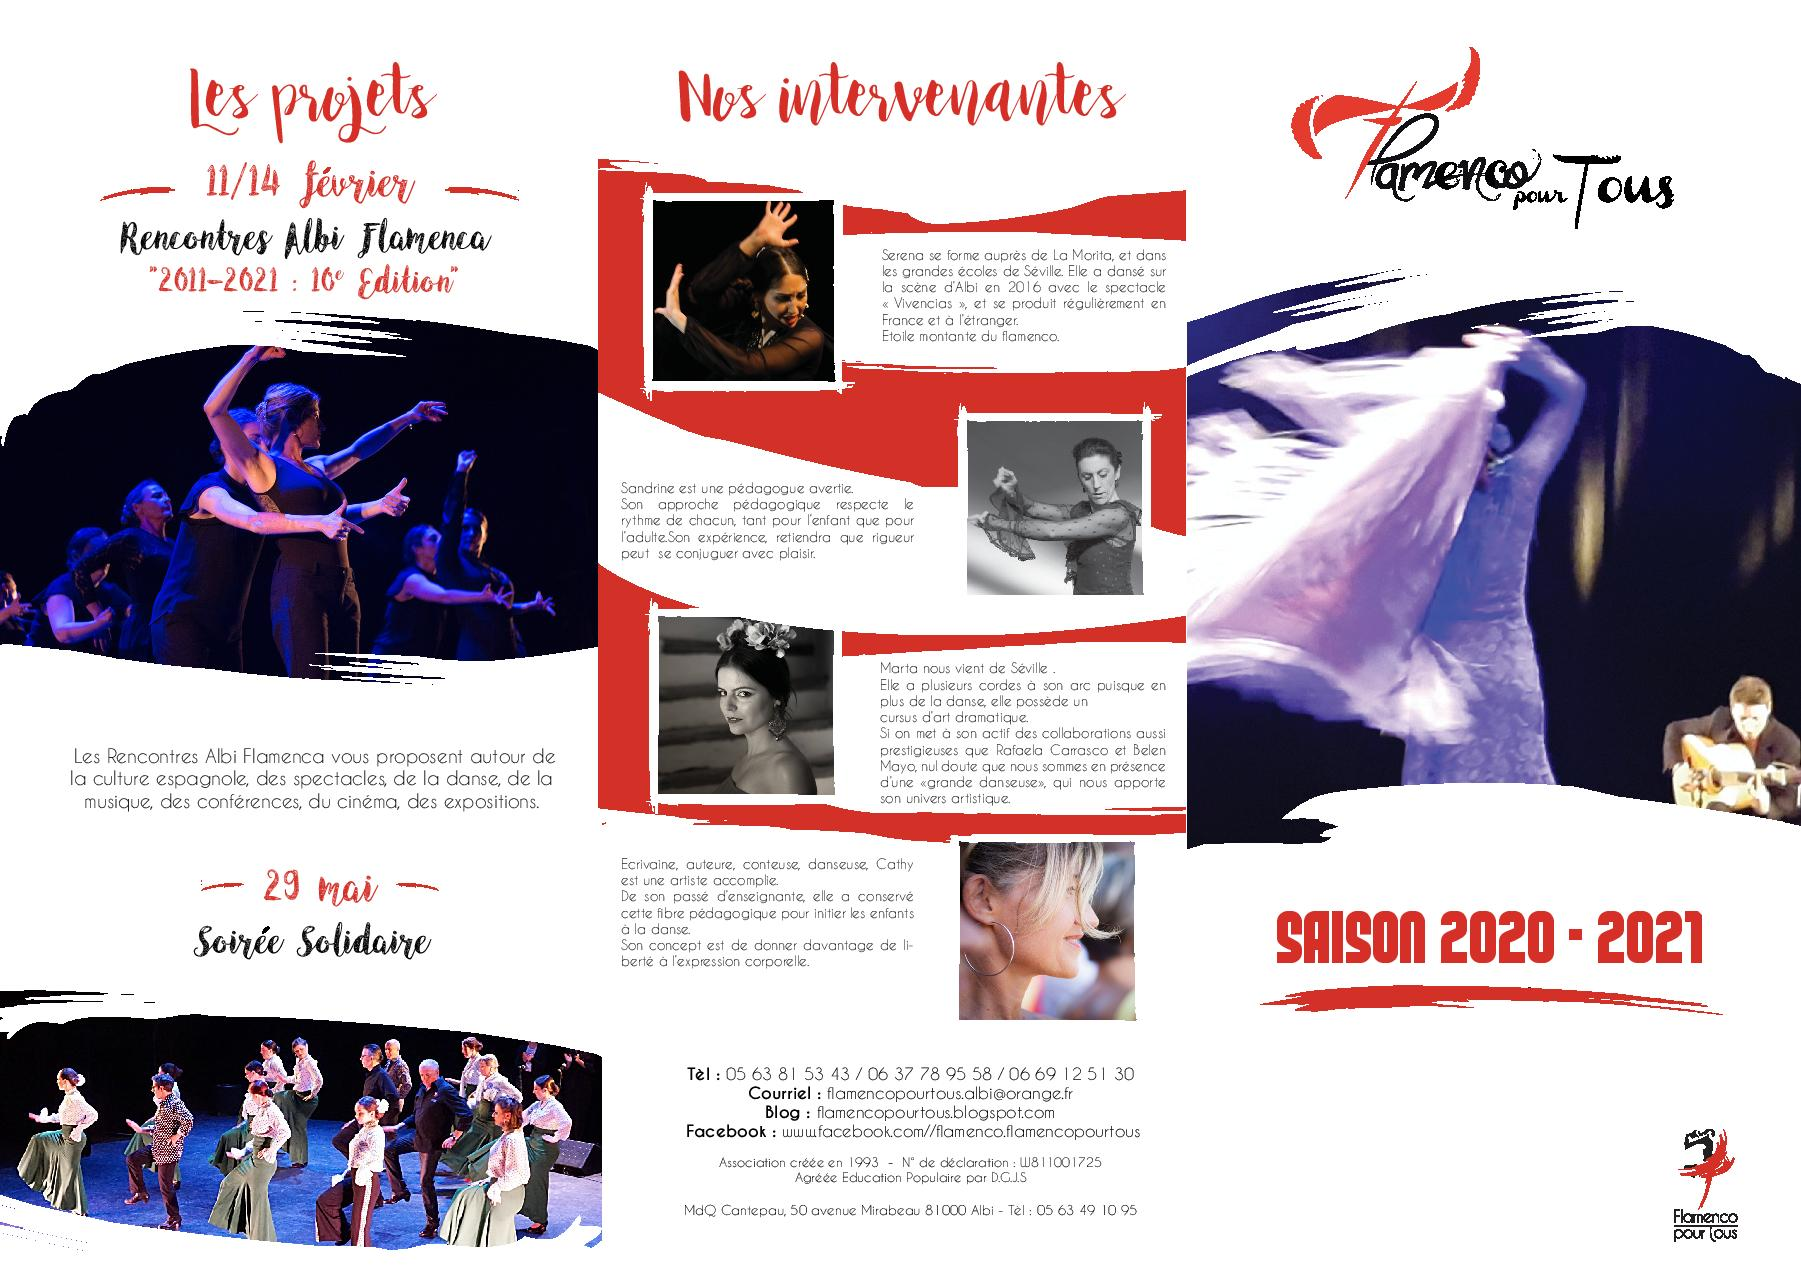 rencontres albi flamenca 2021